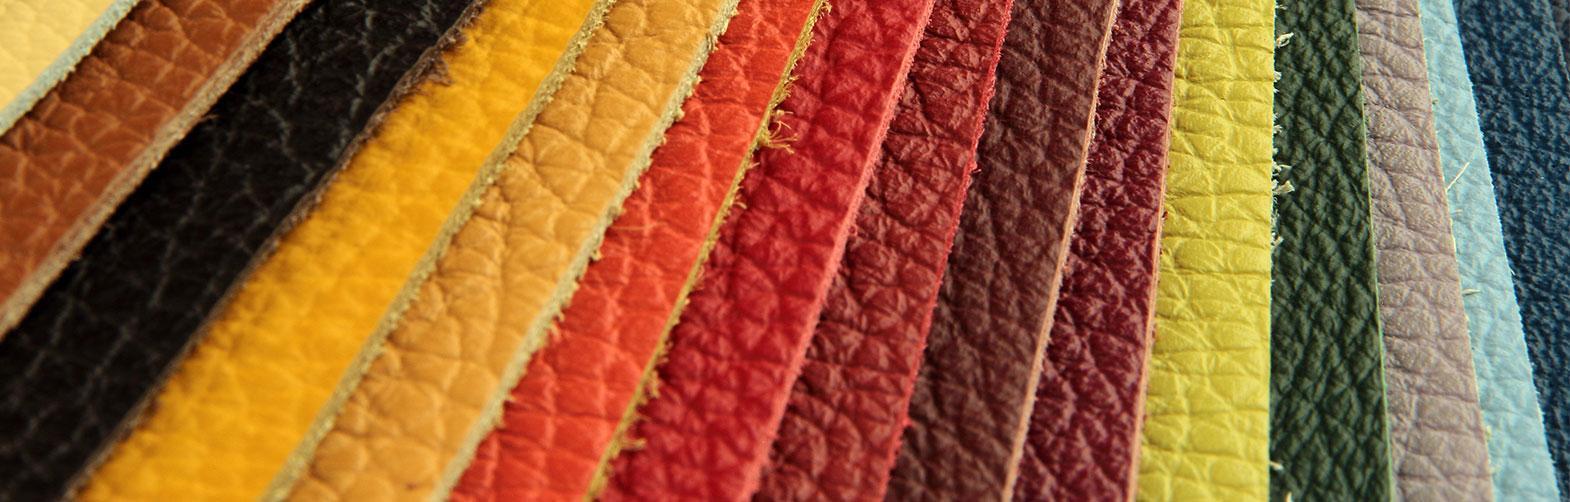 textiel-leder2_3.jpg